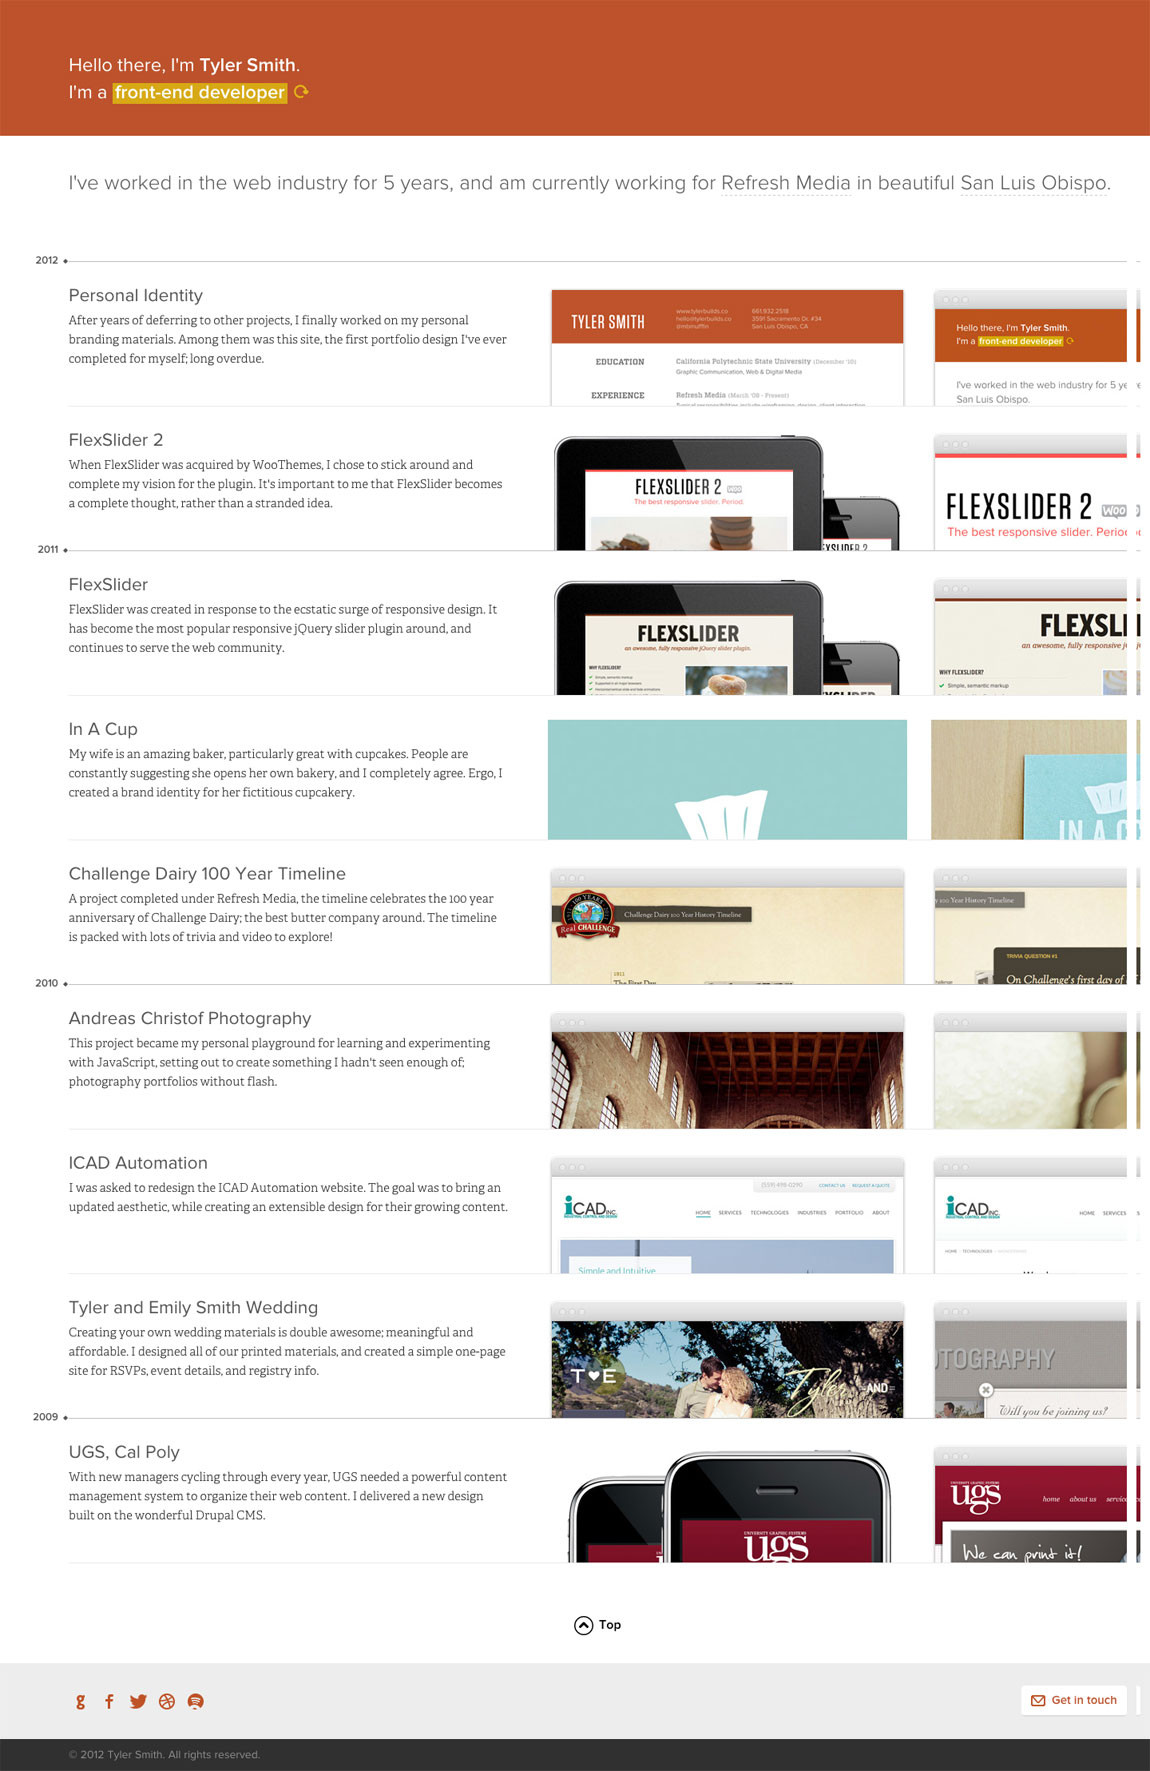 Tyler Smith Website Screenshot